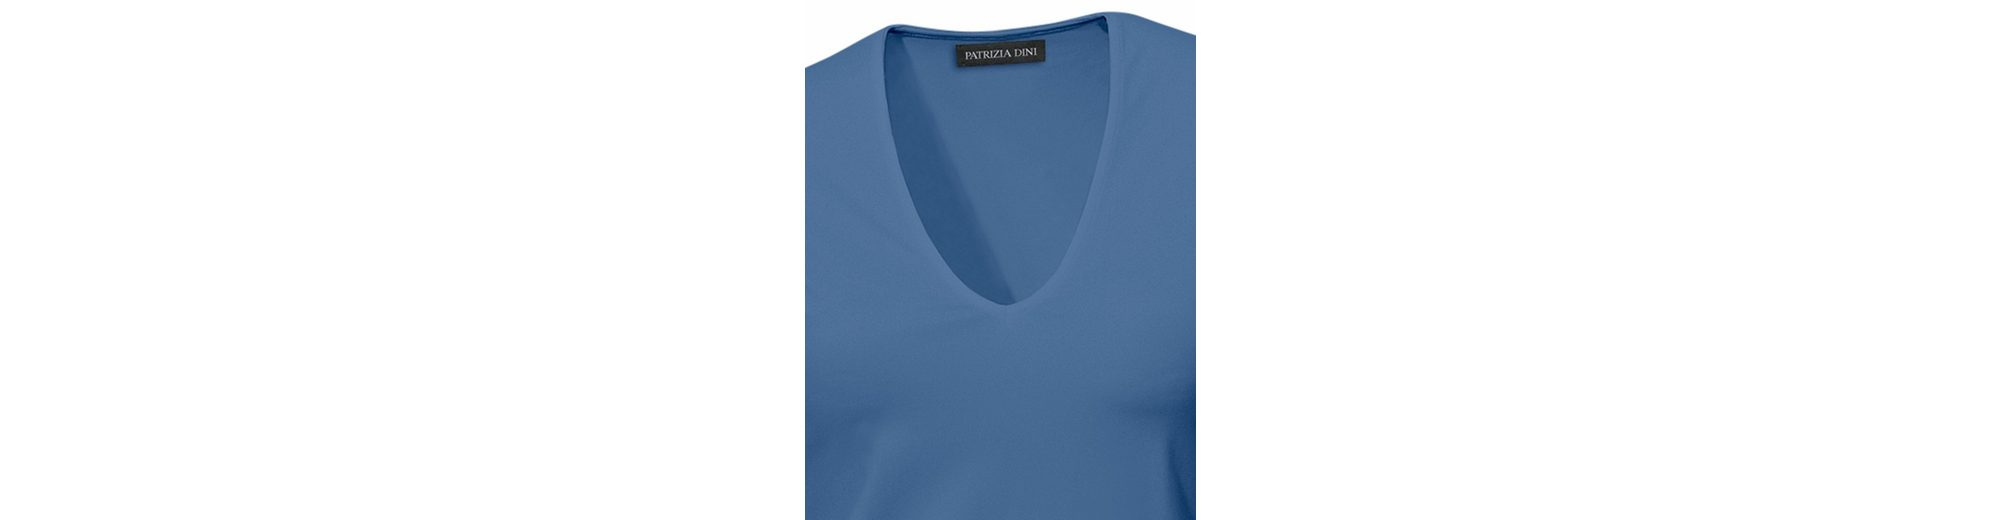 PATRIZIA DINI by Heine V-Shirt Tactel Shop Für Günstige Online Sehr Billig ARCig3KyN